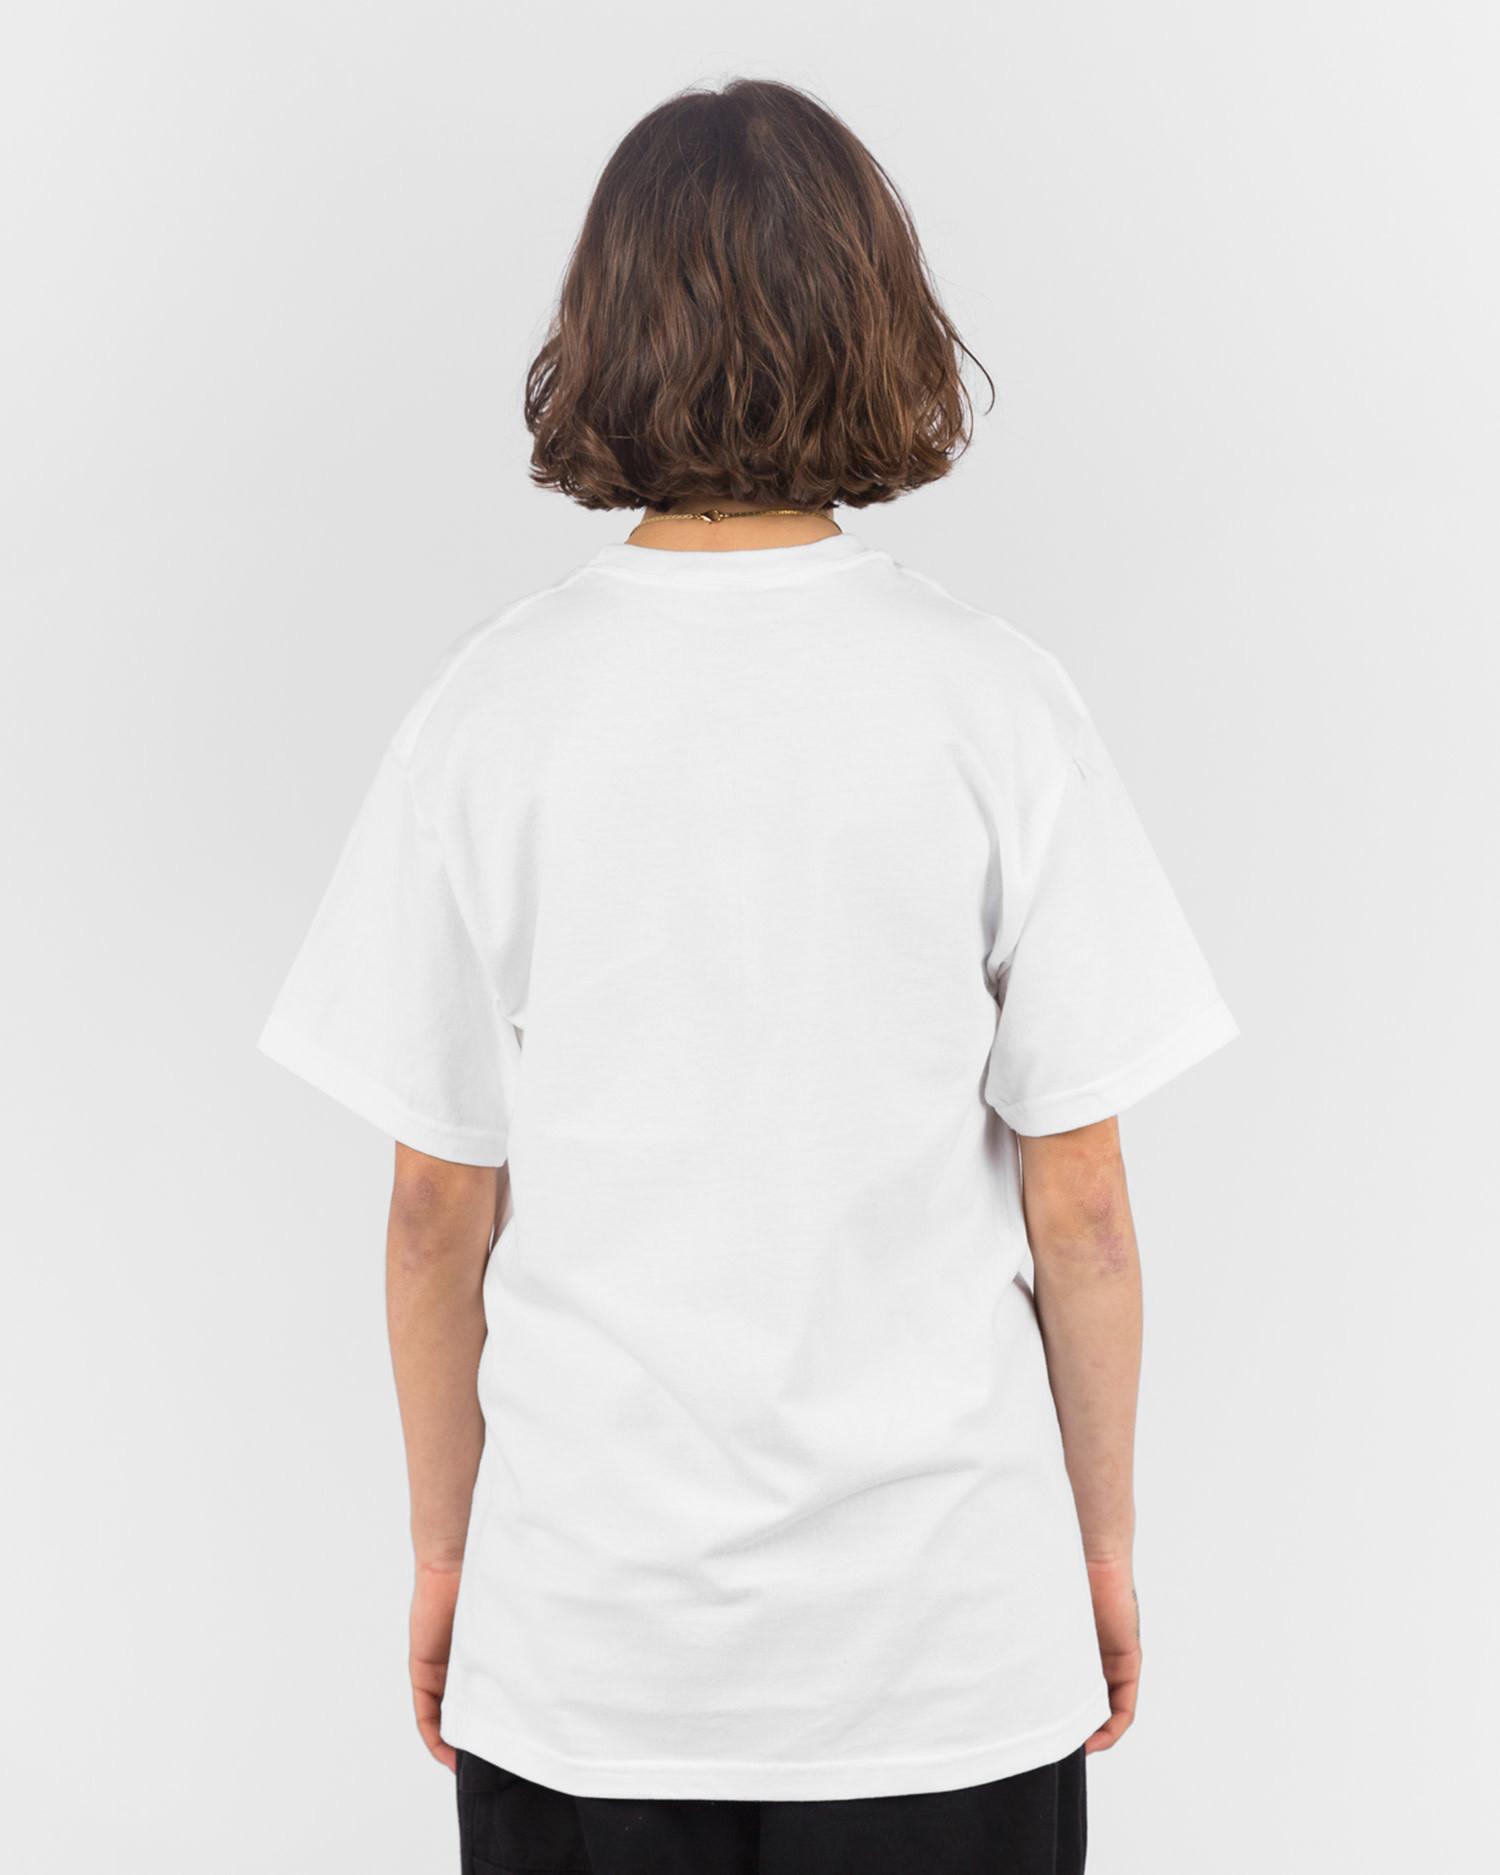 Lockwood LW Varsity T-shirt White/Black